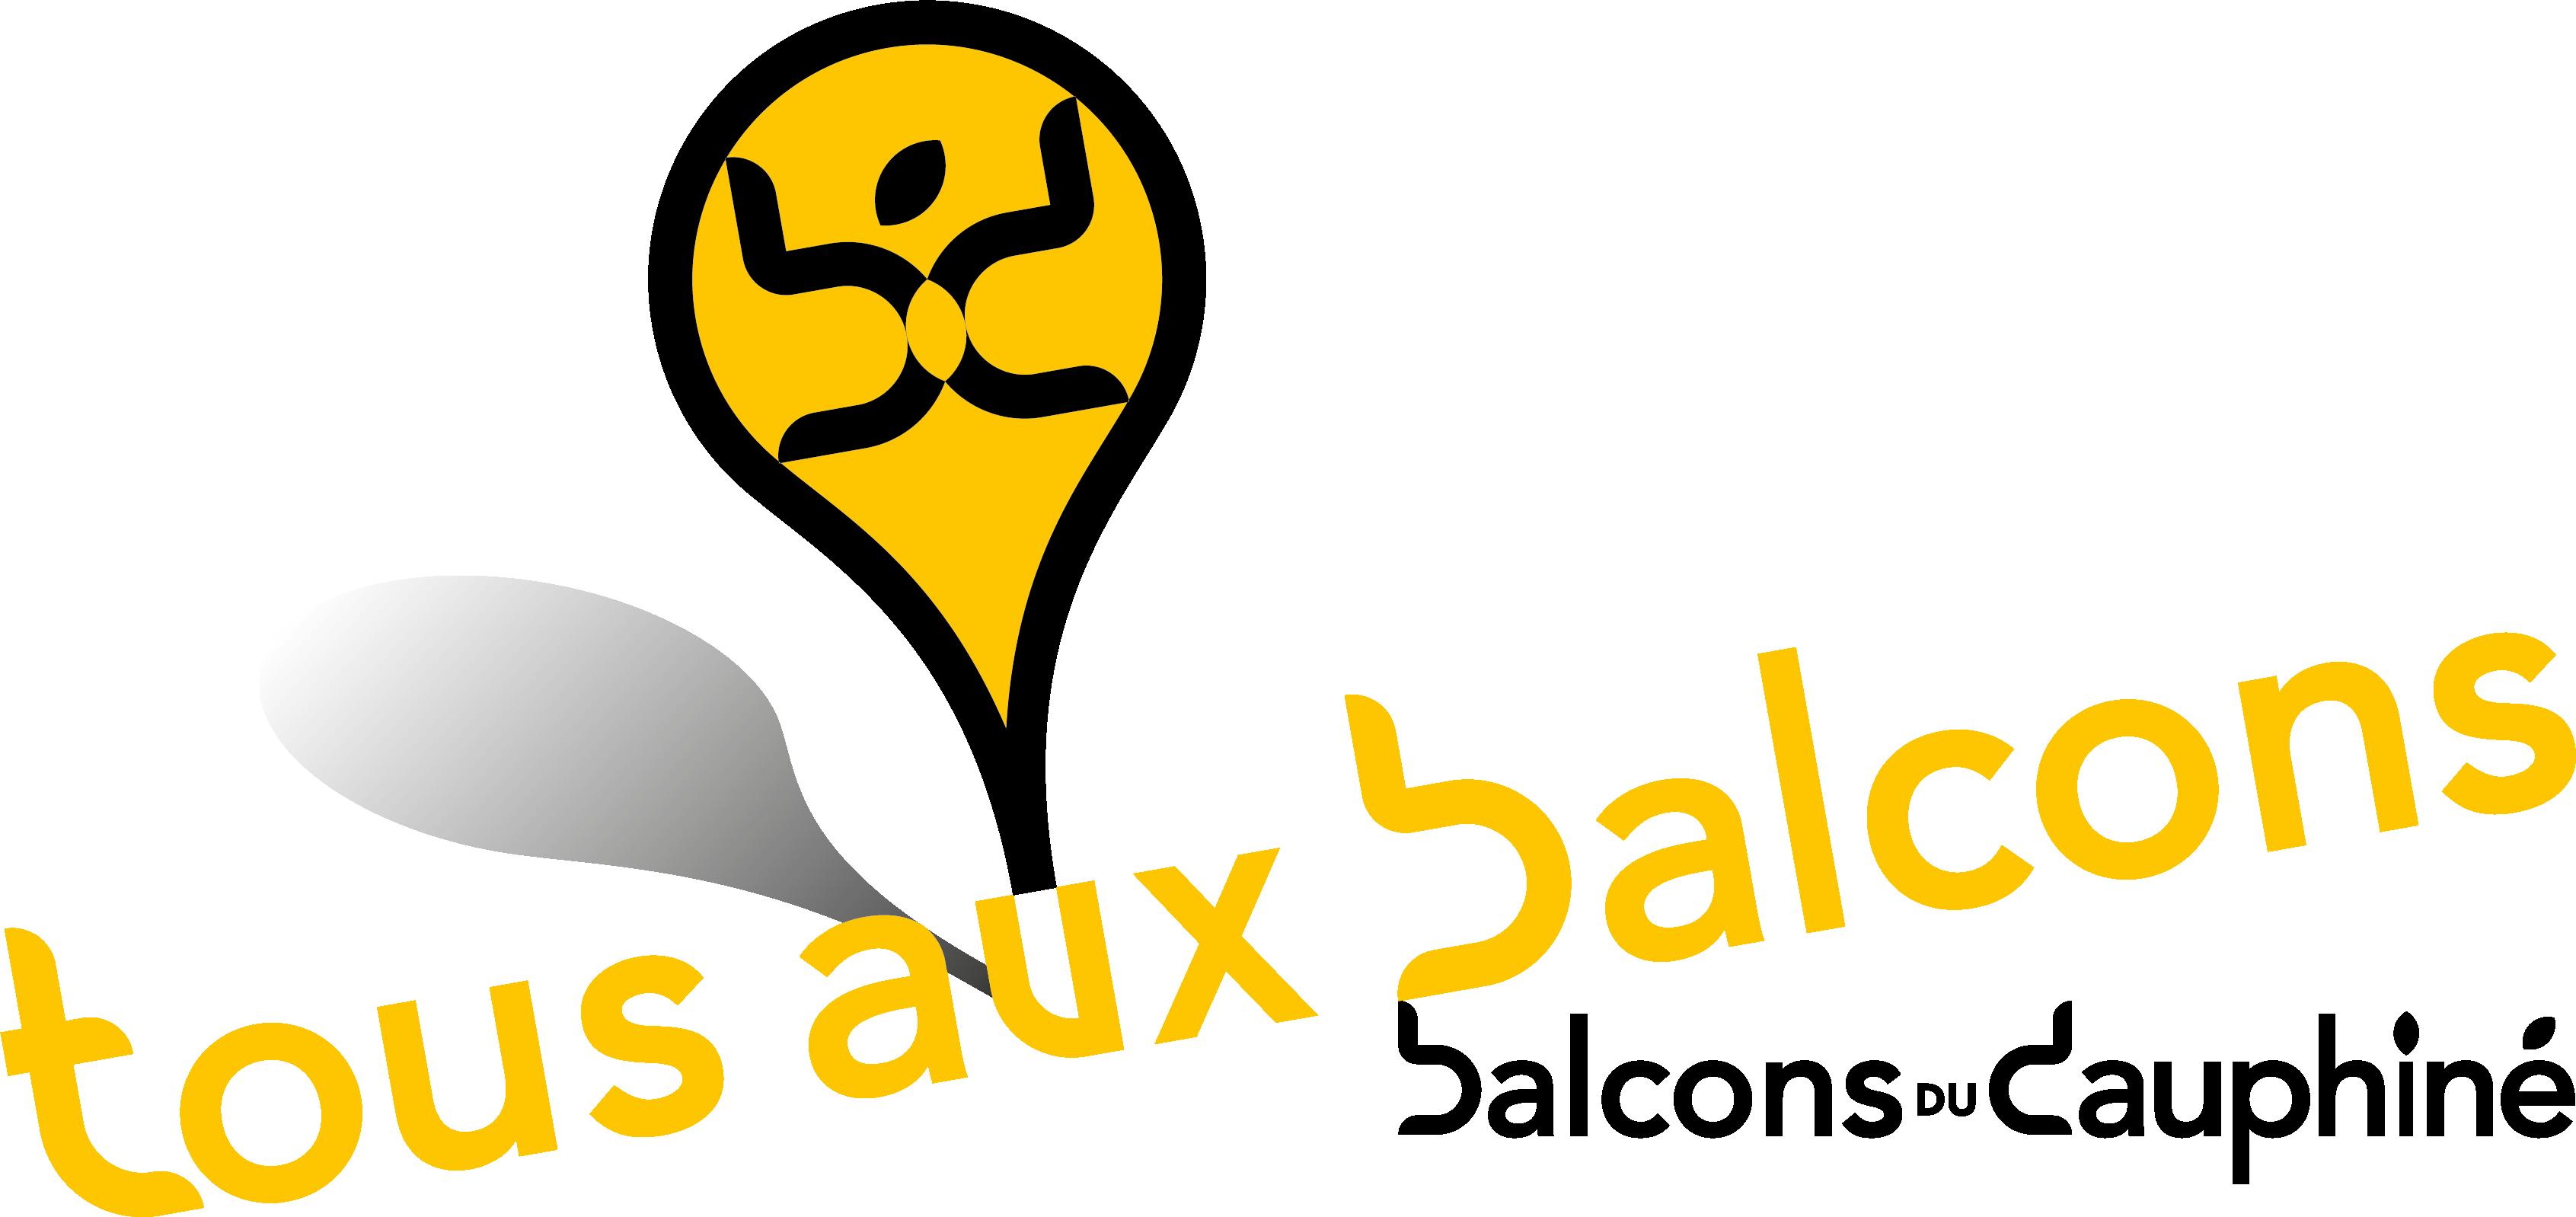 logo-bdd-longueur.png